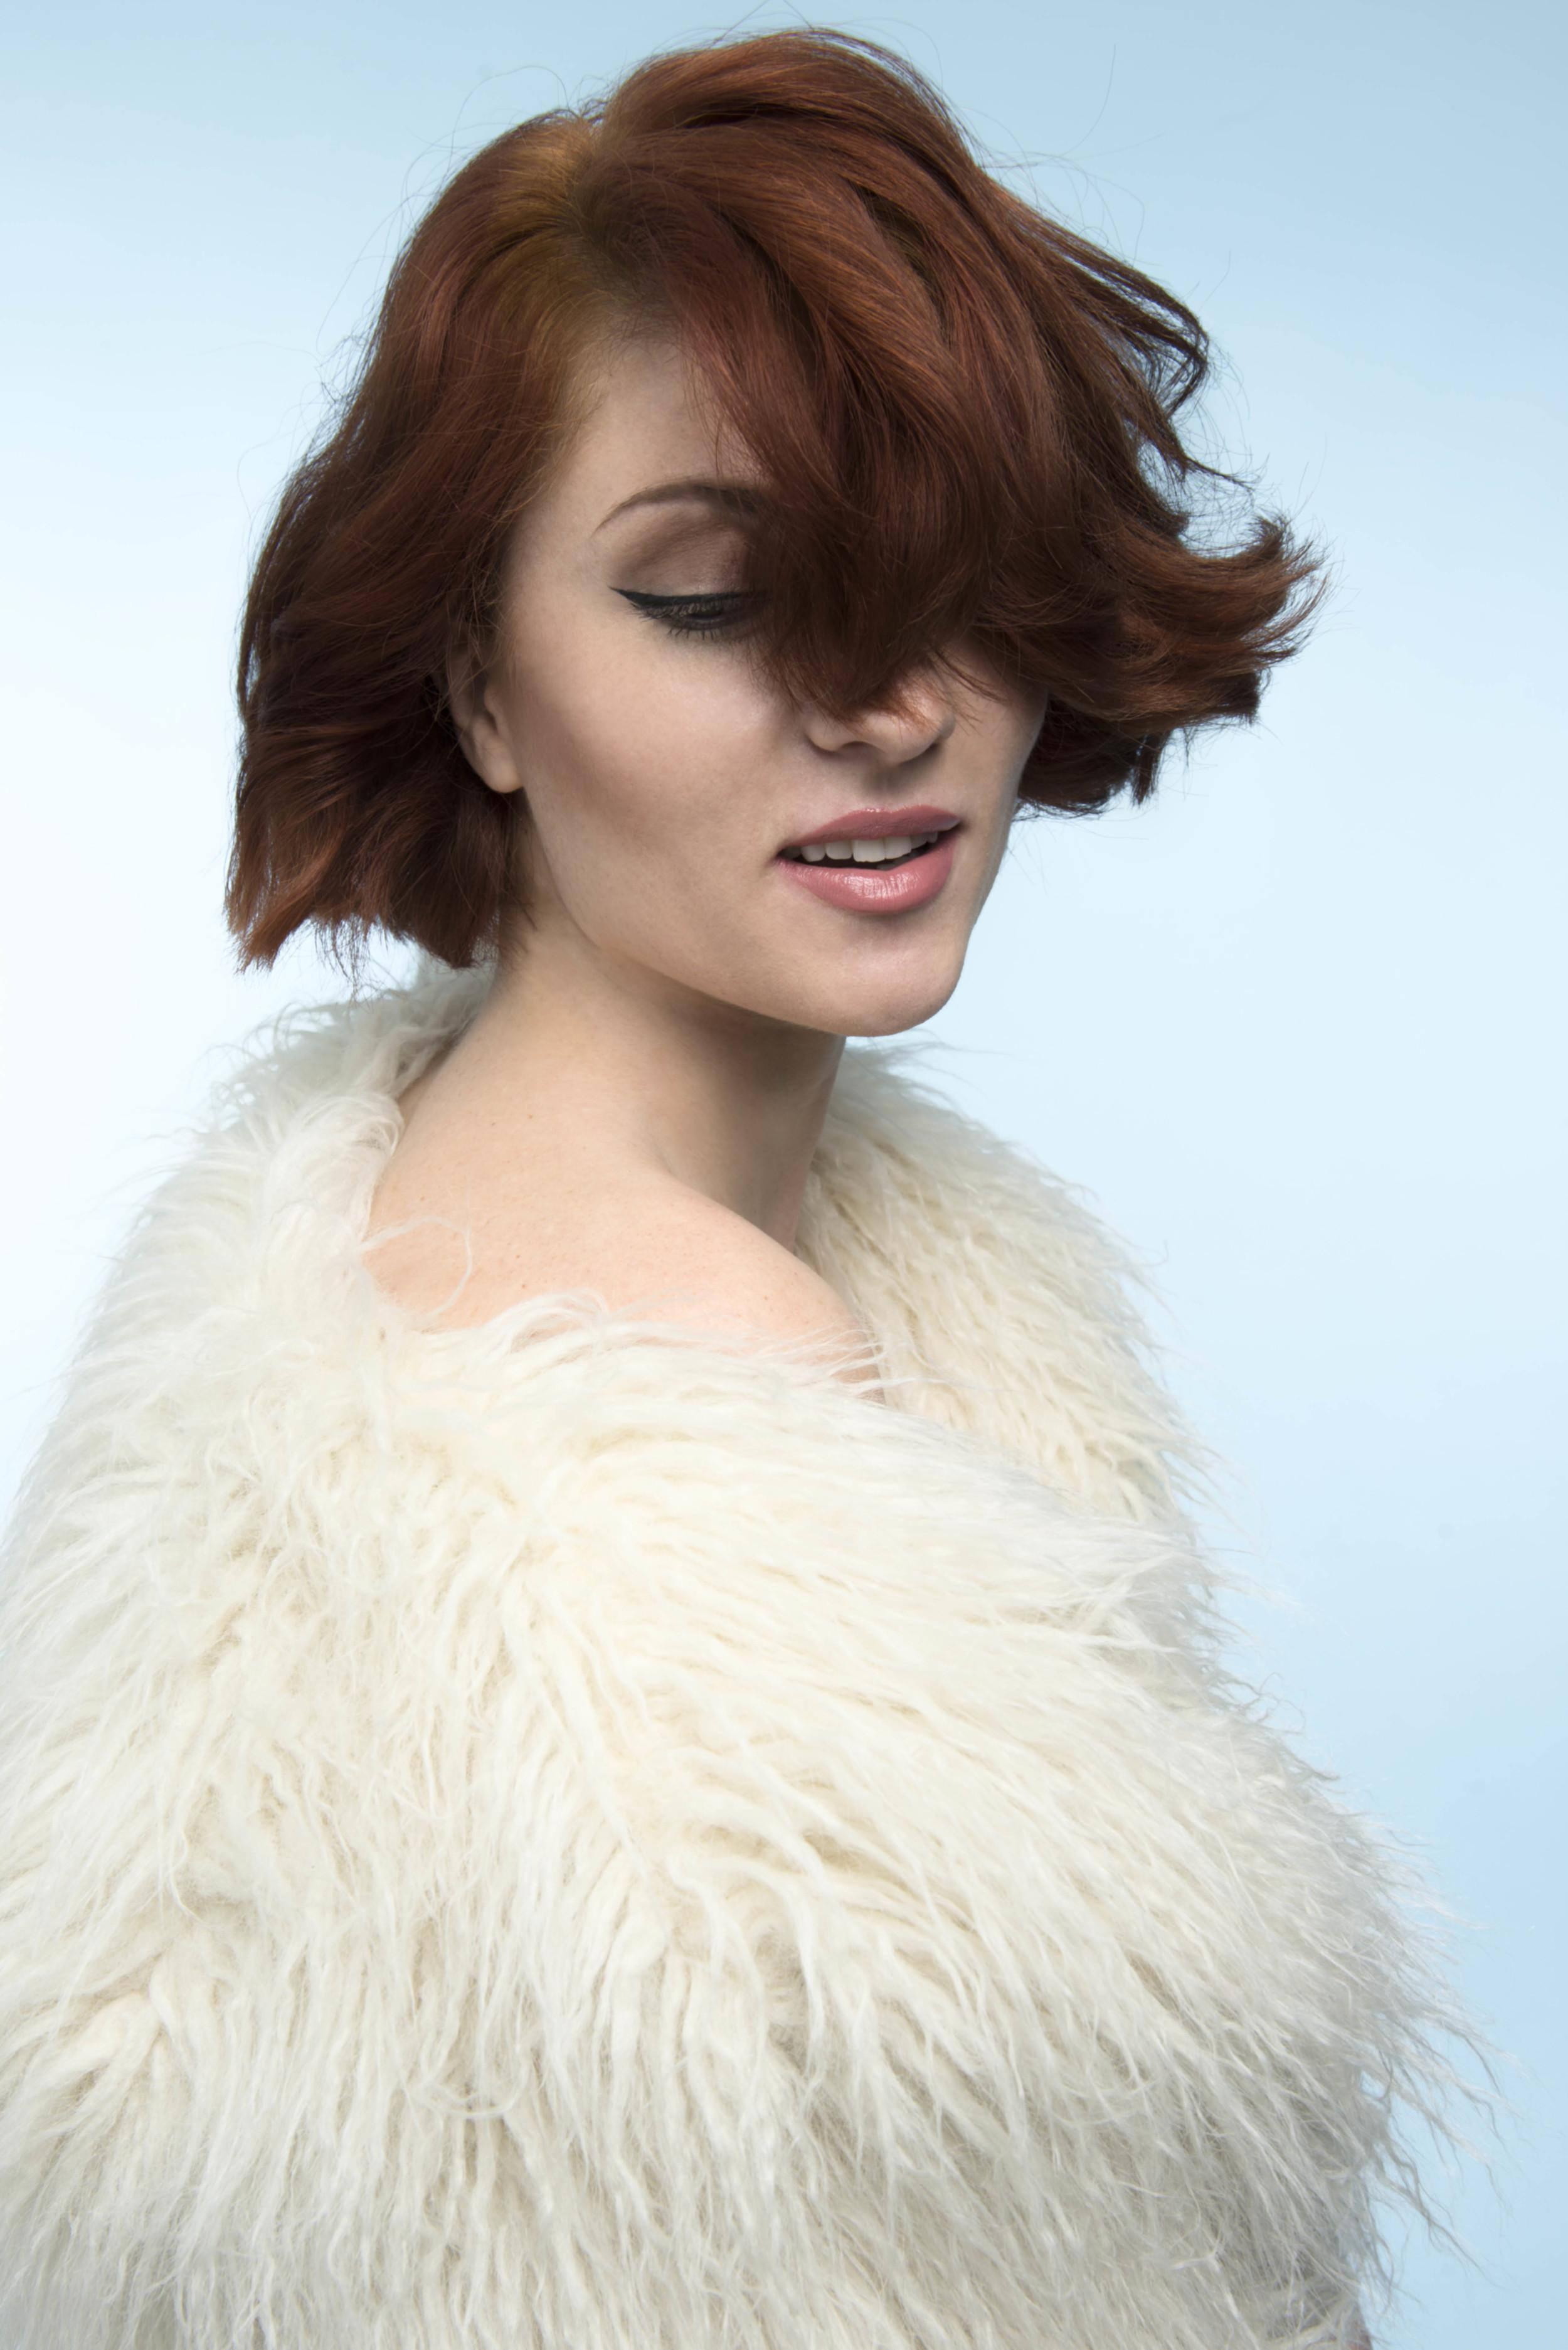 Yves Saint Laurent Beauty /Blogger Bazaar